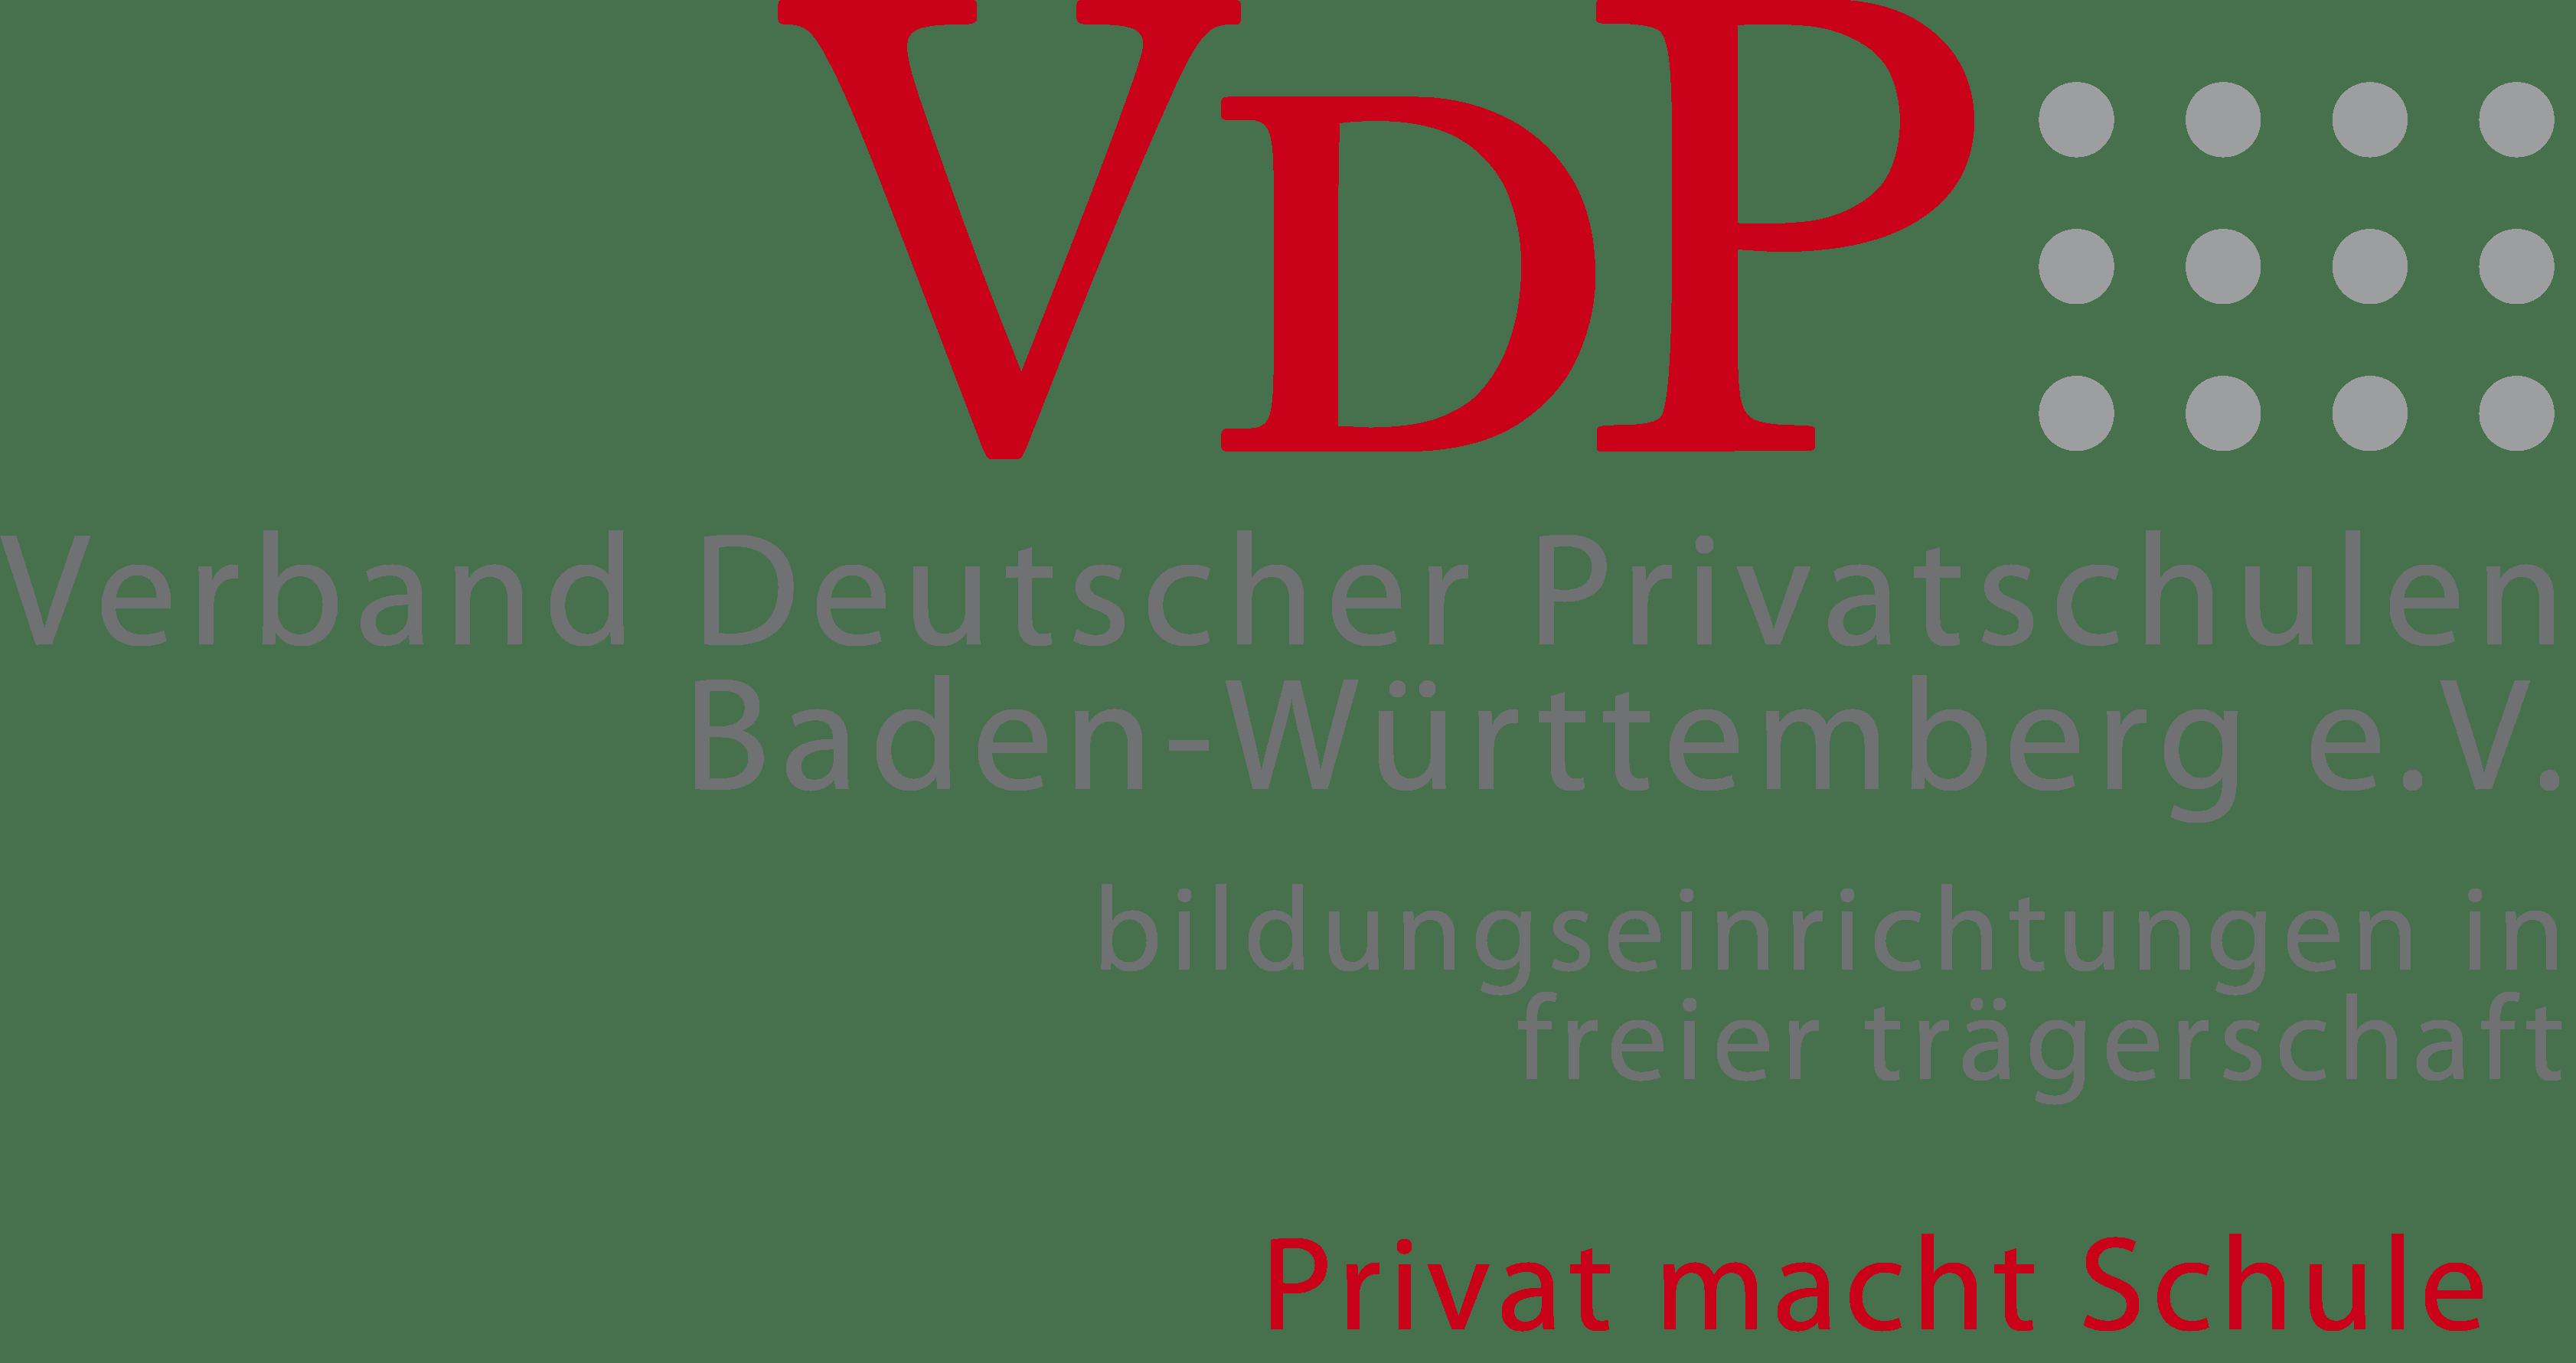 Verband Deutscher Privatschulen Baden-Württemberg e.V.